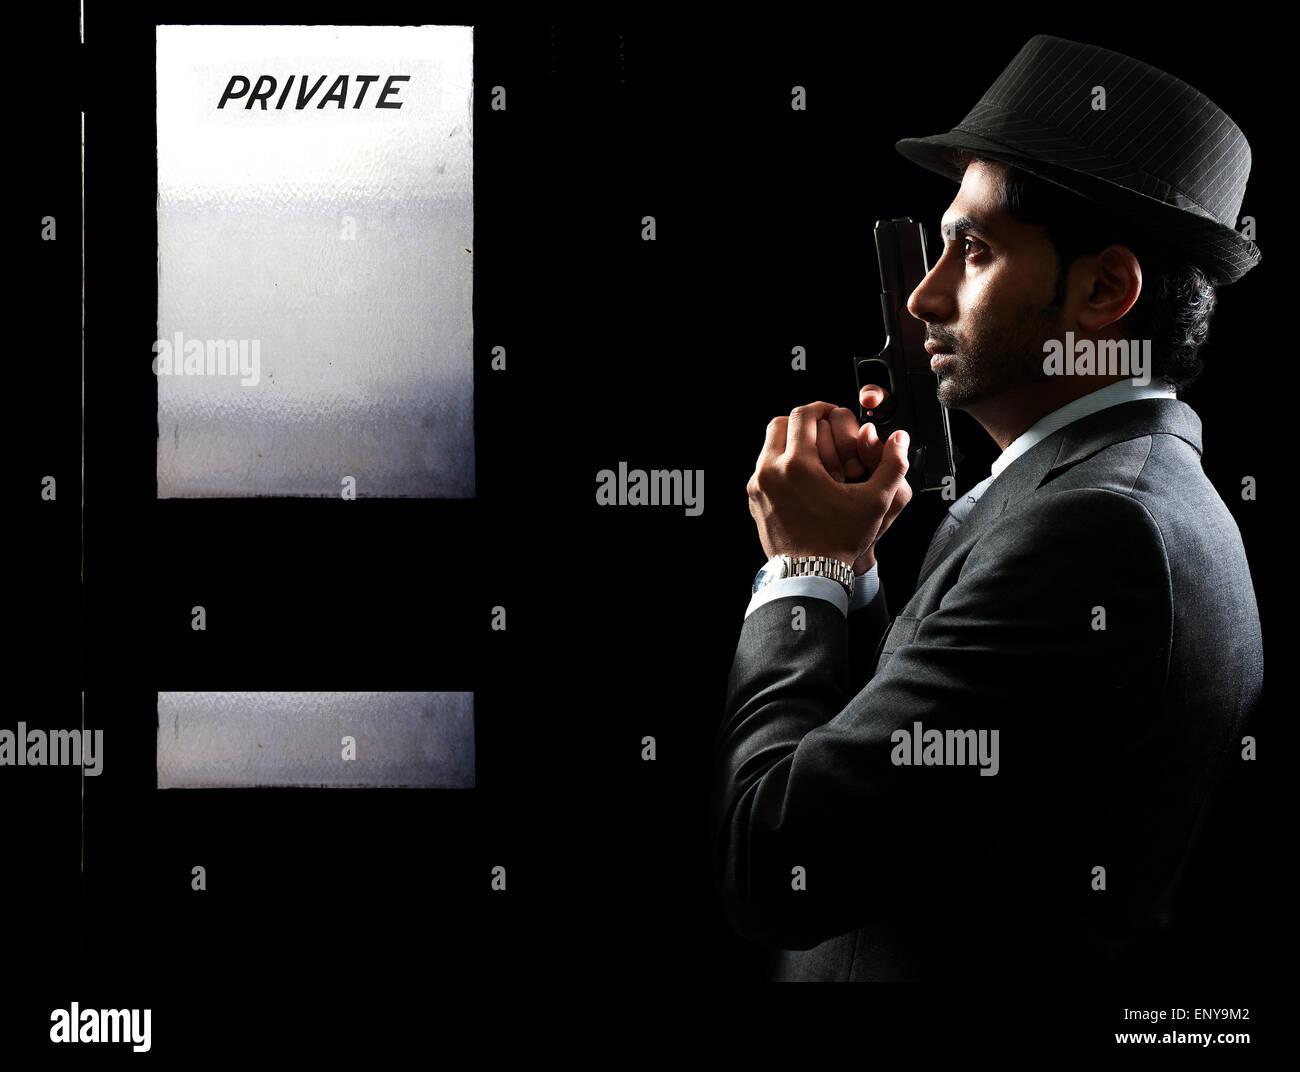 Privatdetektiv Stockbild